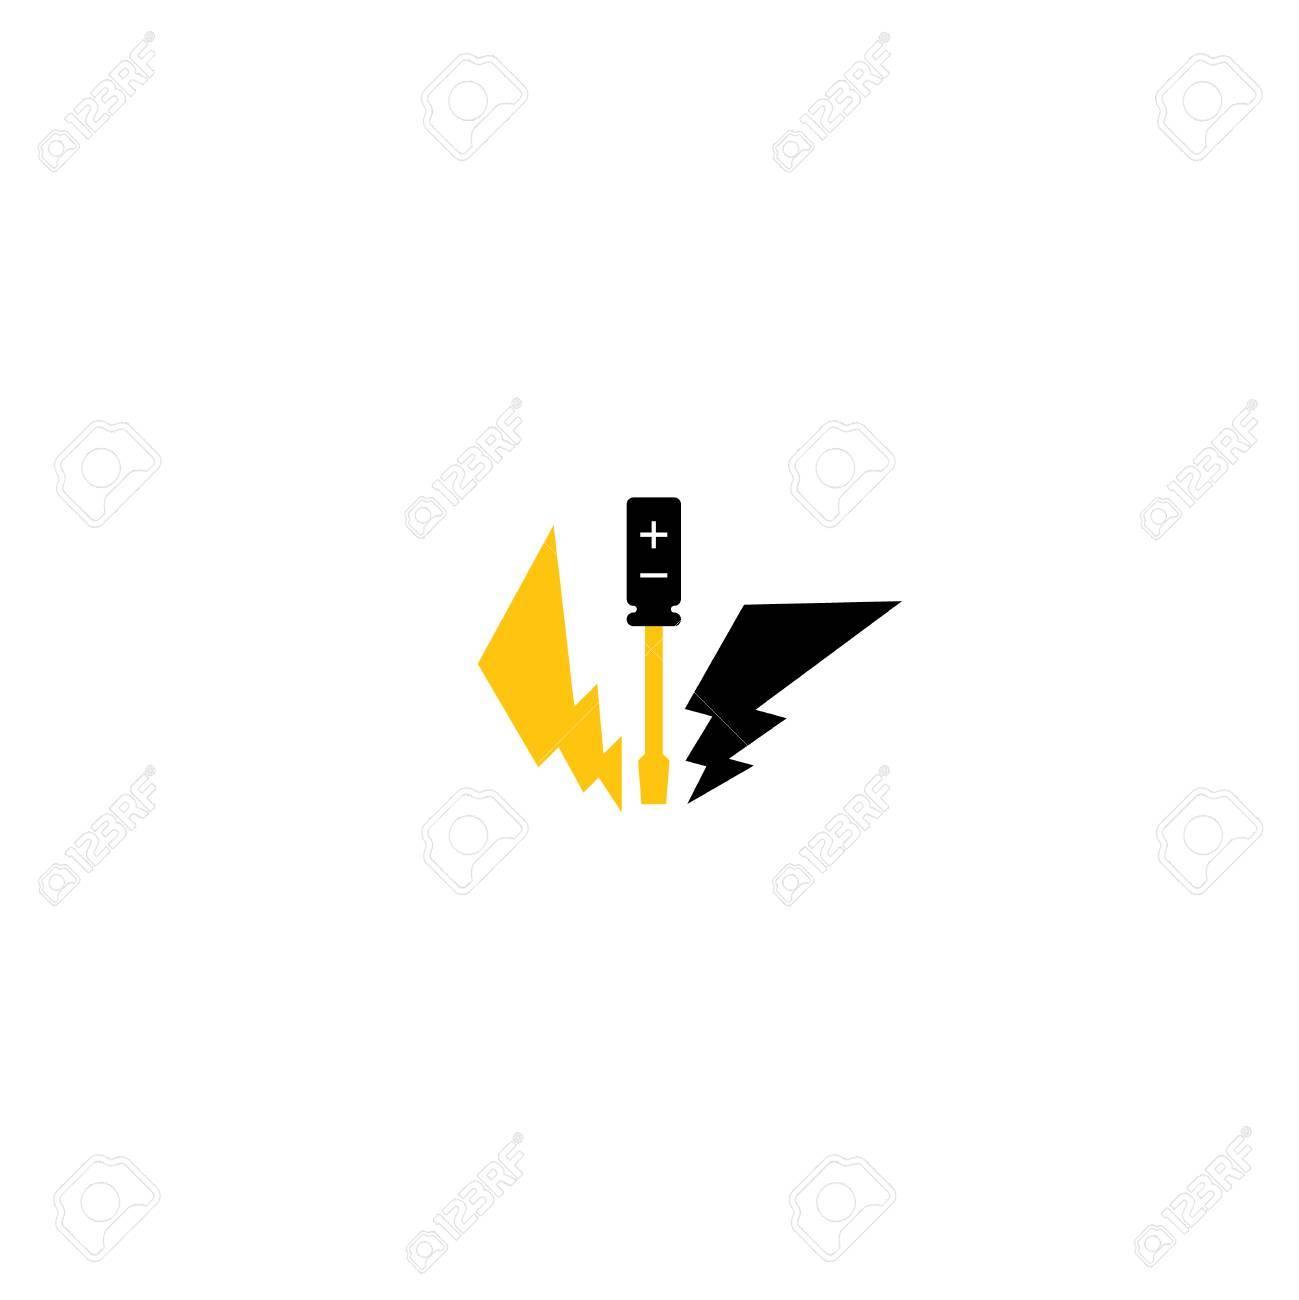 Electrical service set. Under construction. Caution sign. - 49575720